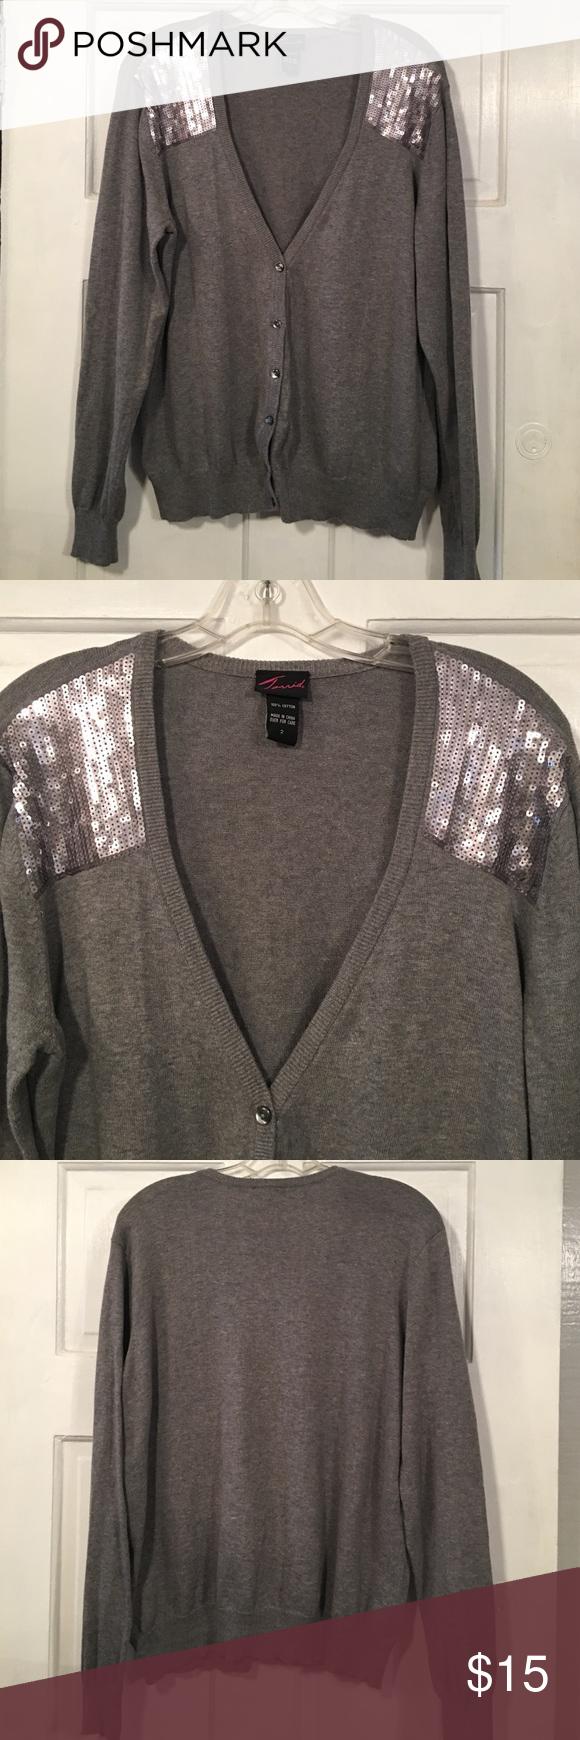 Grey Sequin Cardigan | Grey, Sweater cardigan and Sequins